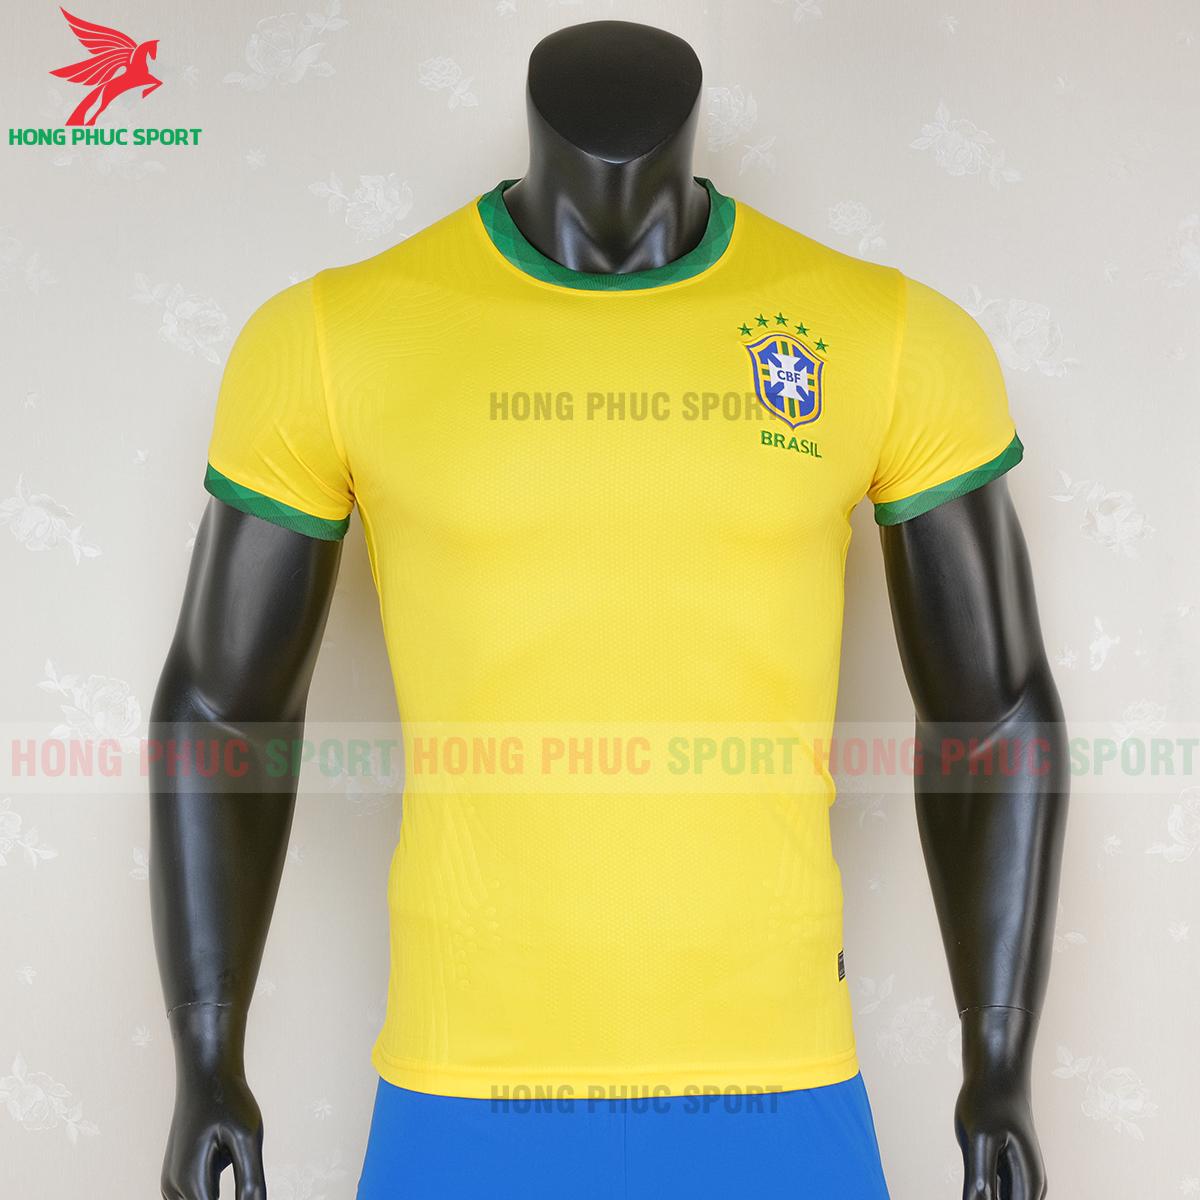 https://cdn.hongphucsport.com/unsafe/s4.shopbay.vn/files/285/ao-bong-da-tuyen-brazil-2020-2021-san-nha-5-5f71698f76597.png